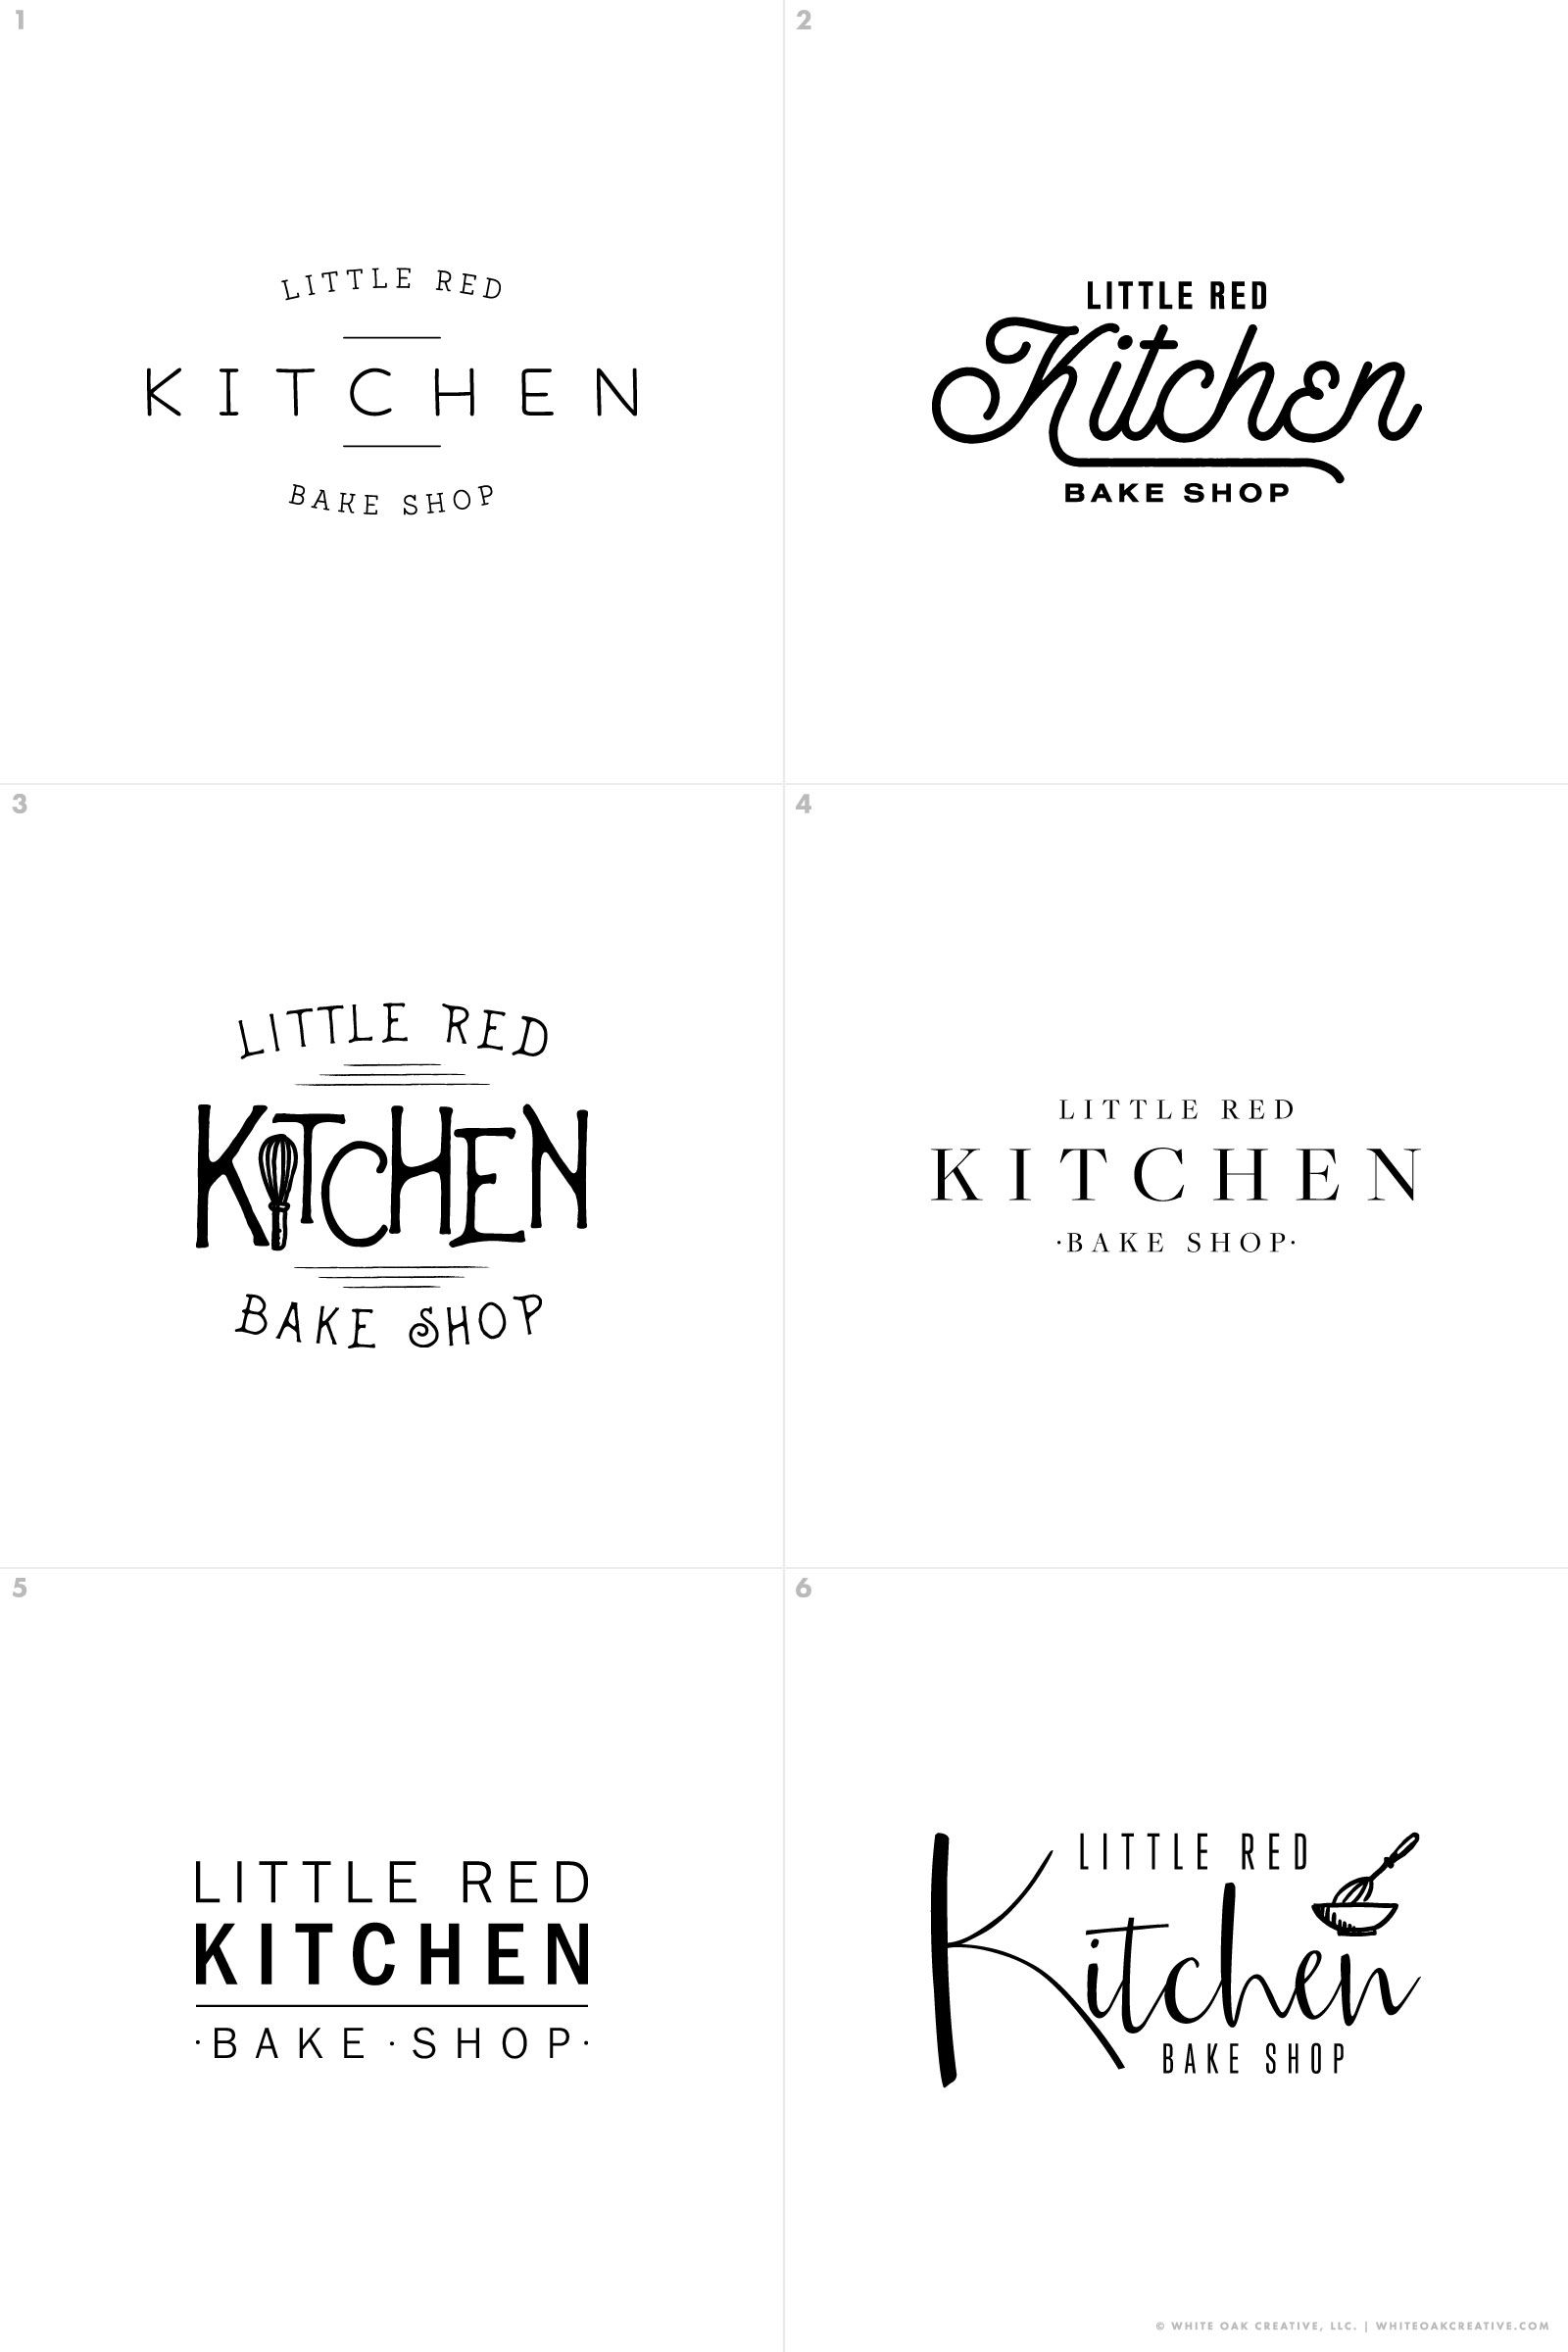 Little Red Kitchen Bake Shop Restaurant logo design